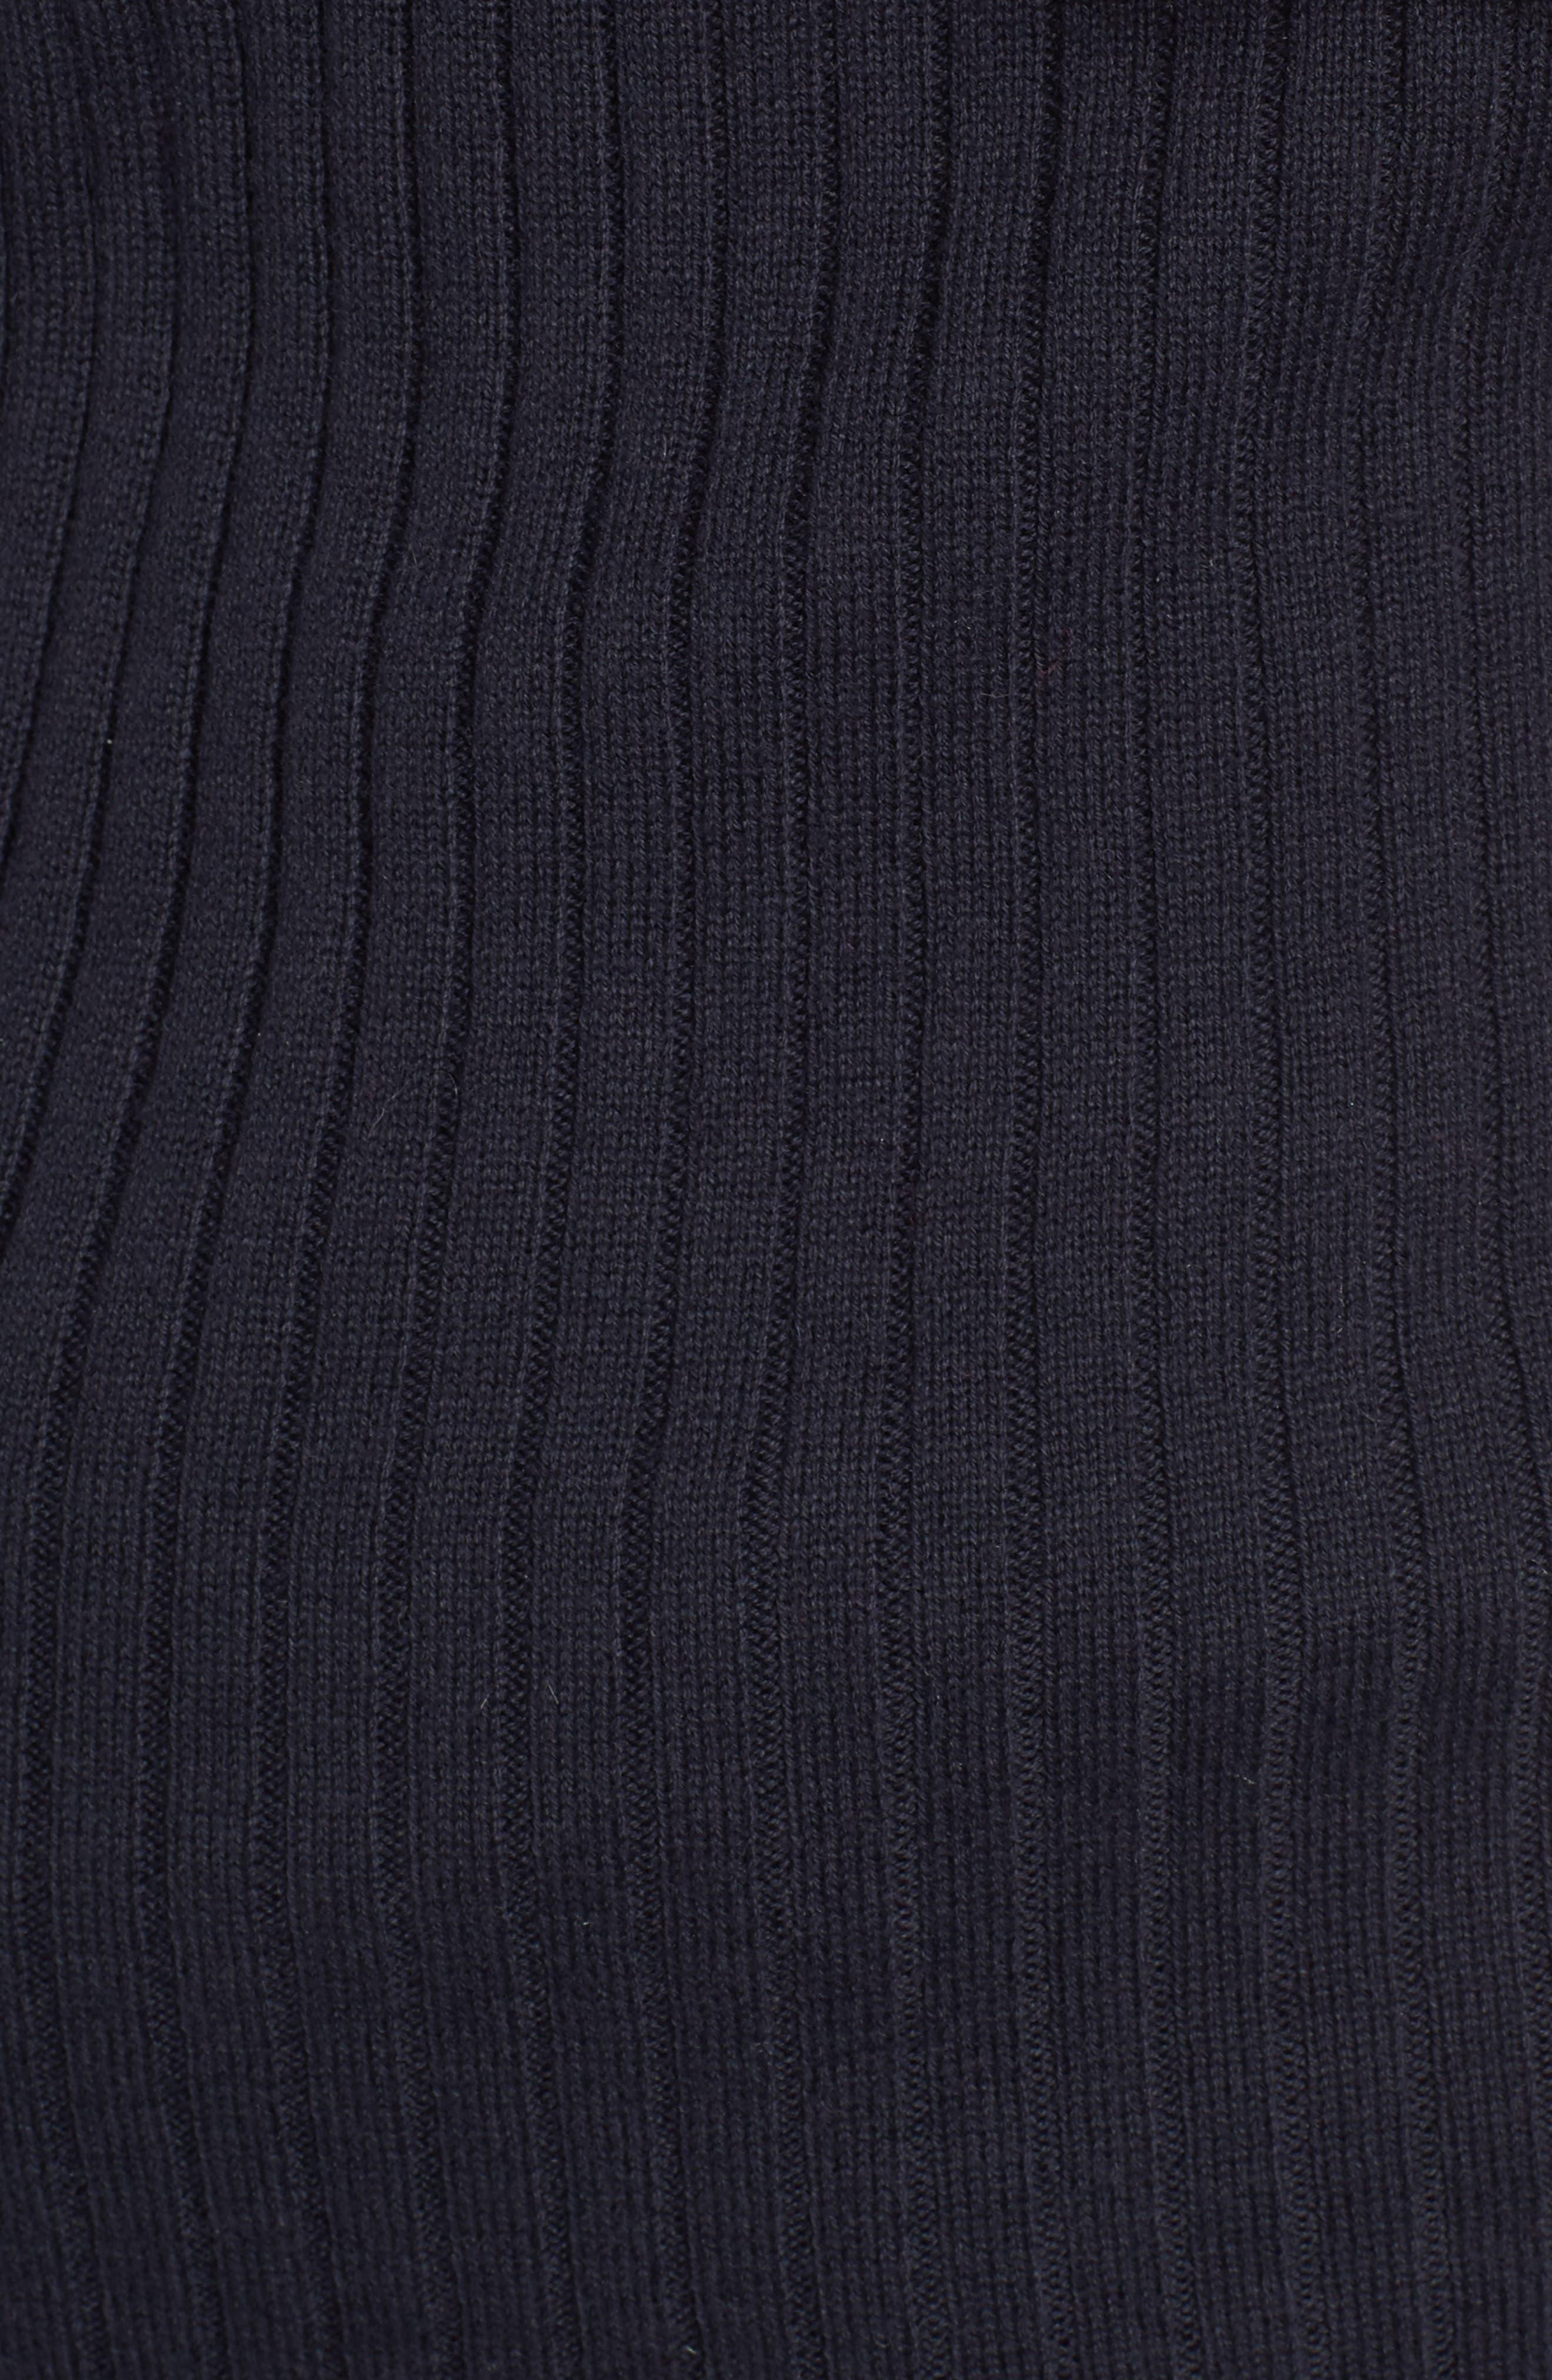 Ava One Shoulder Cotton & Cashmere Sweater,                             Alternate thumbnail 5, color,                             Navy